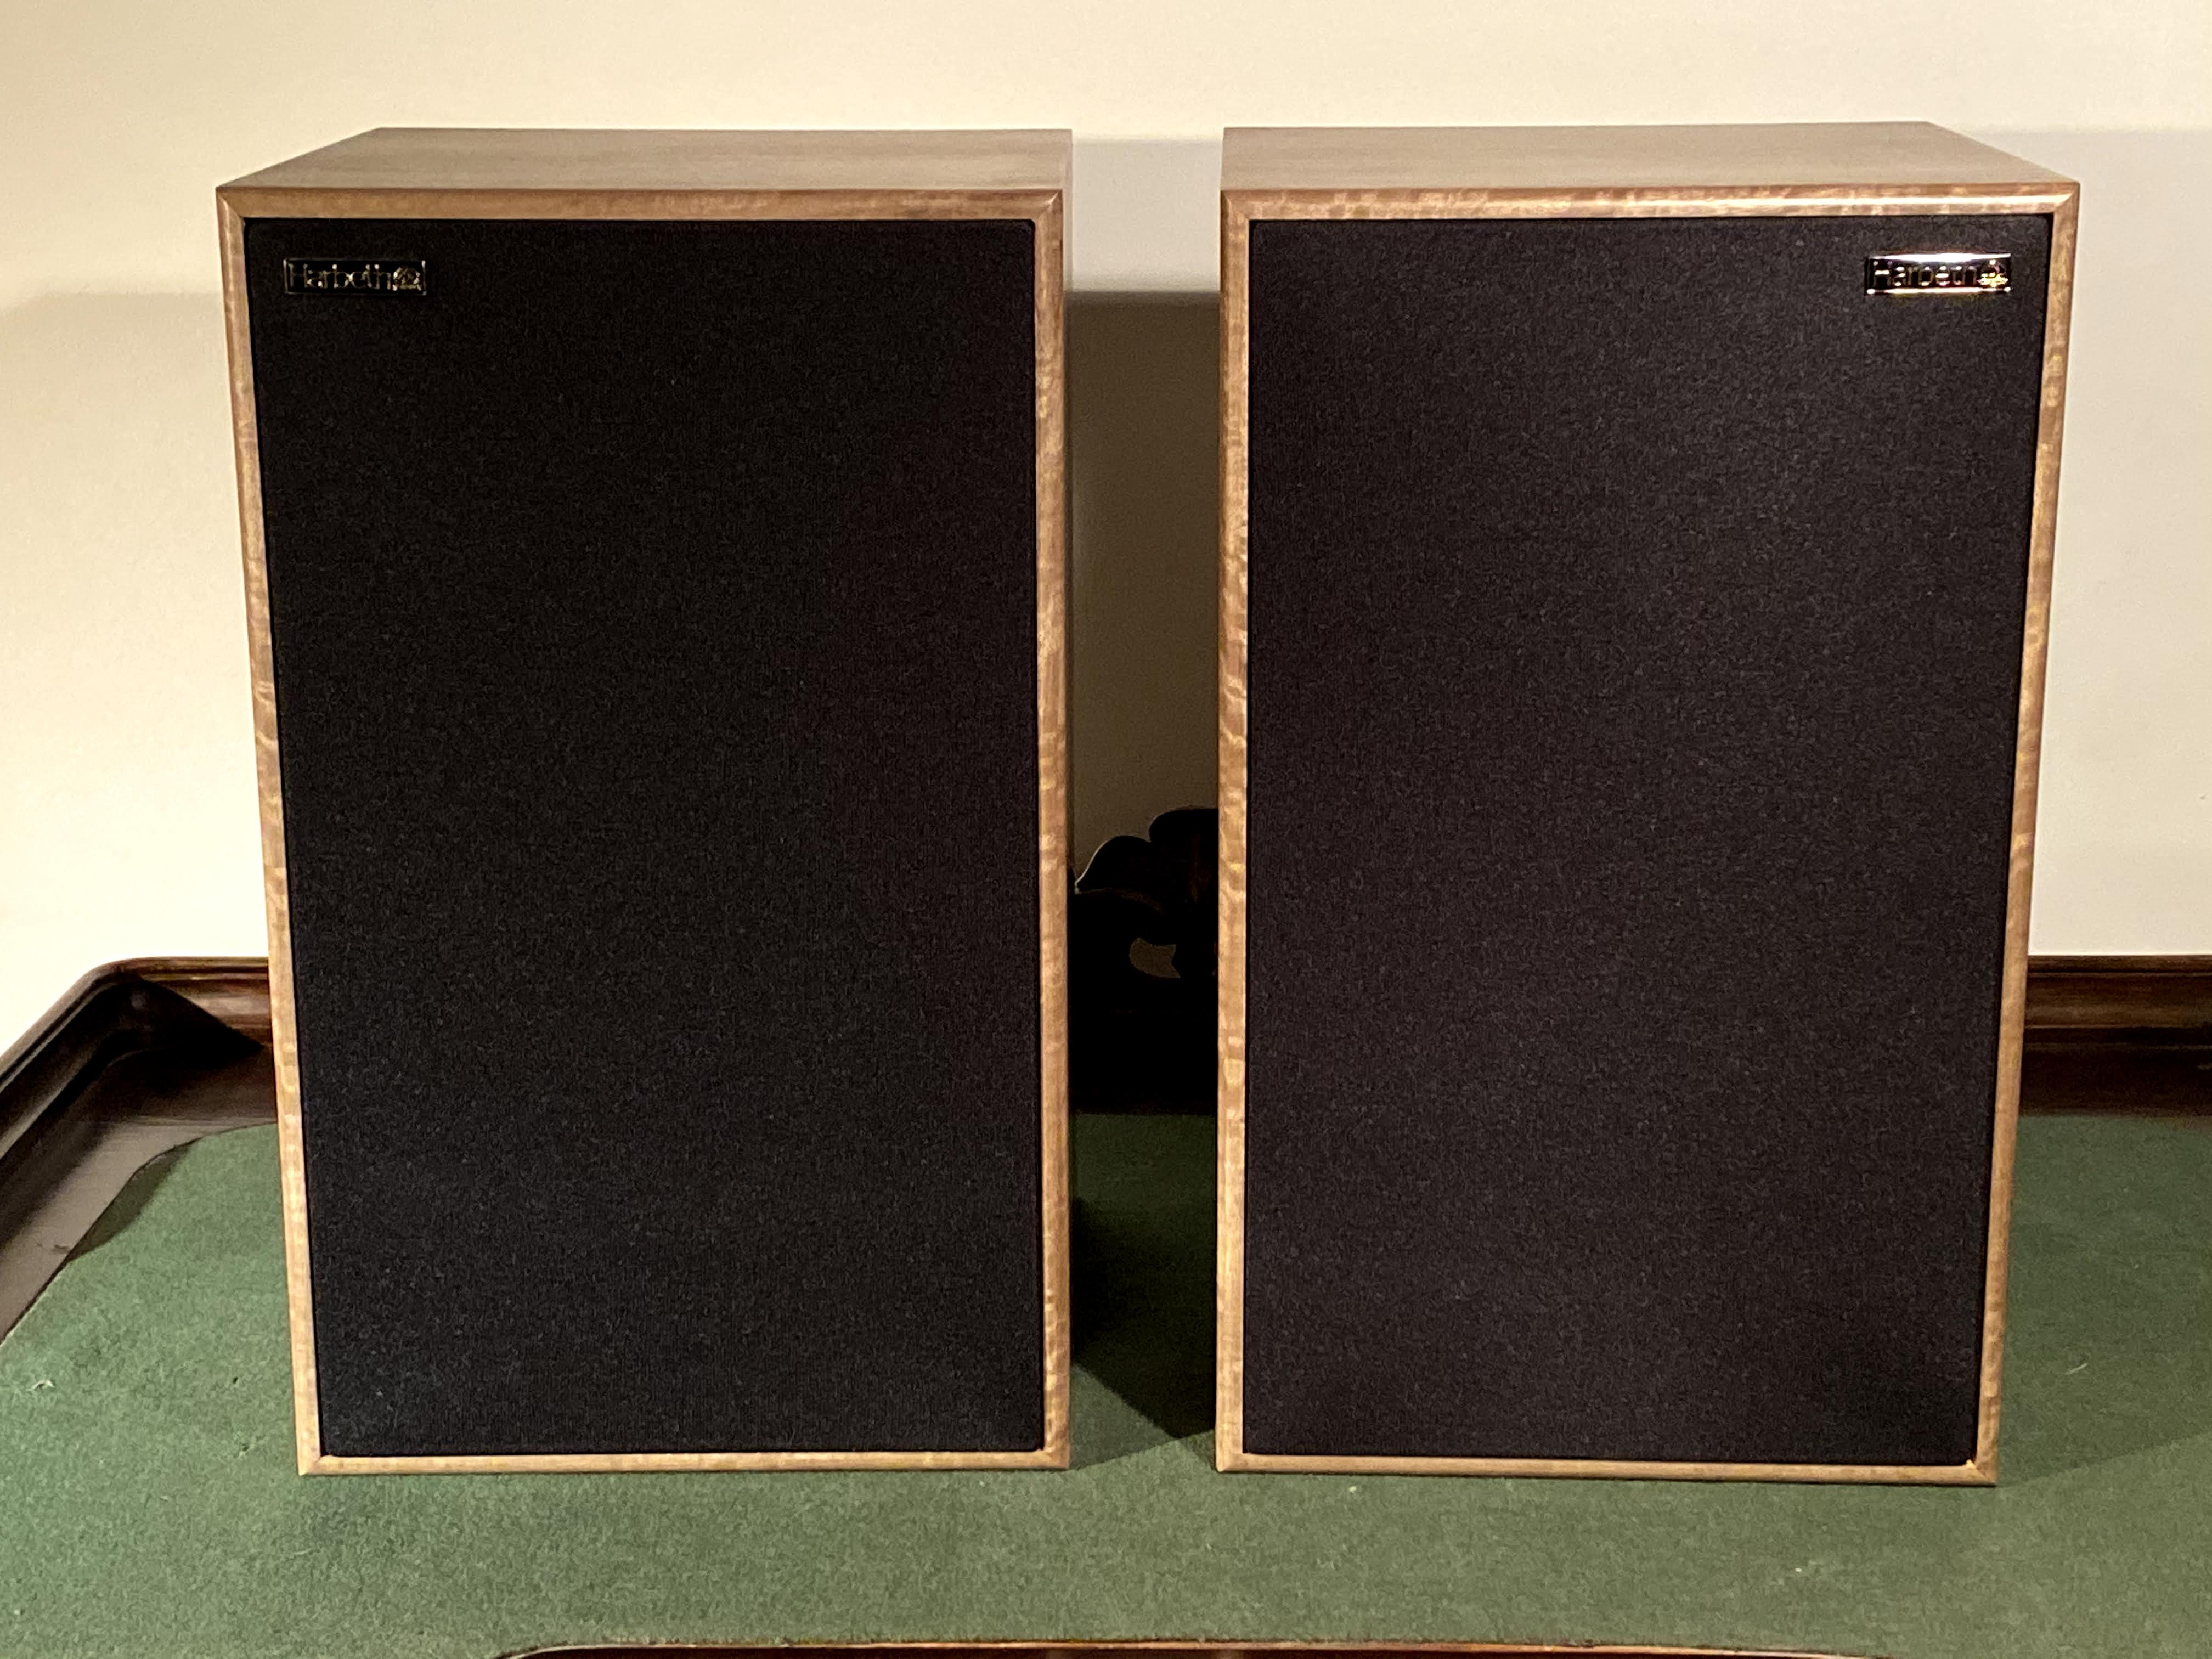 Harbeth M30.2 40th Anniversary Edition